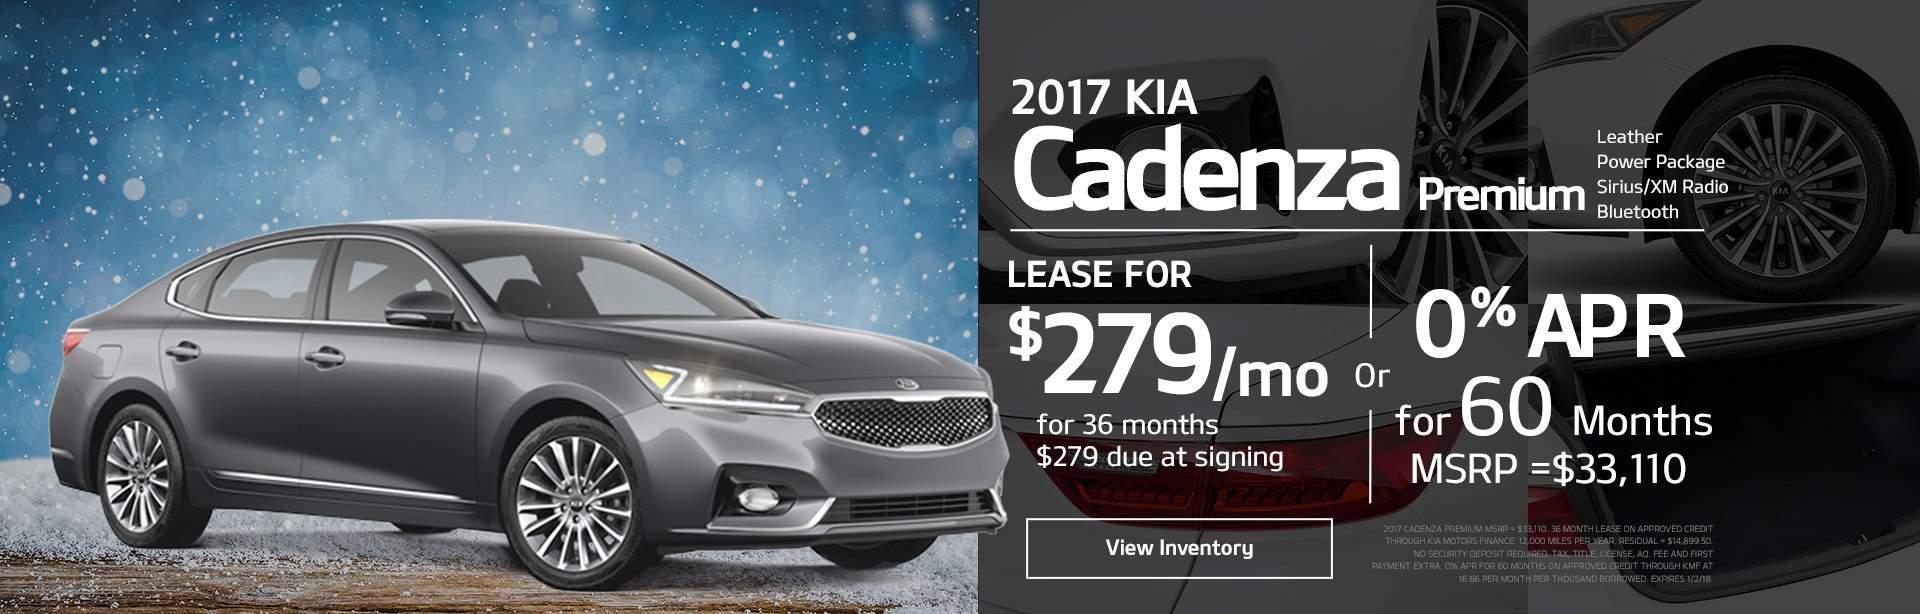 Moritz Kia Fort Worth >> Kia Dealership Fort Worth Tx Used Cars Moritz Kia Ft Worth West